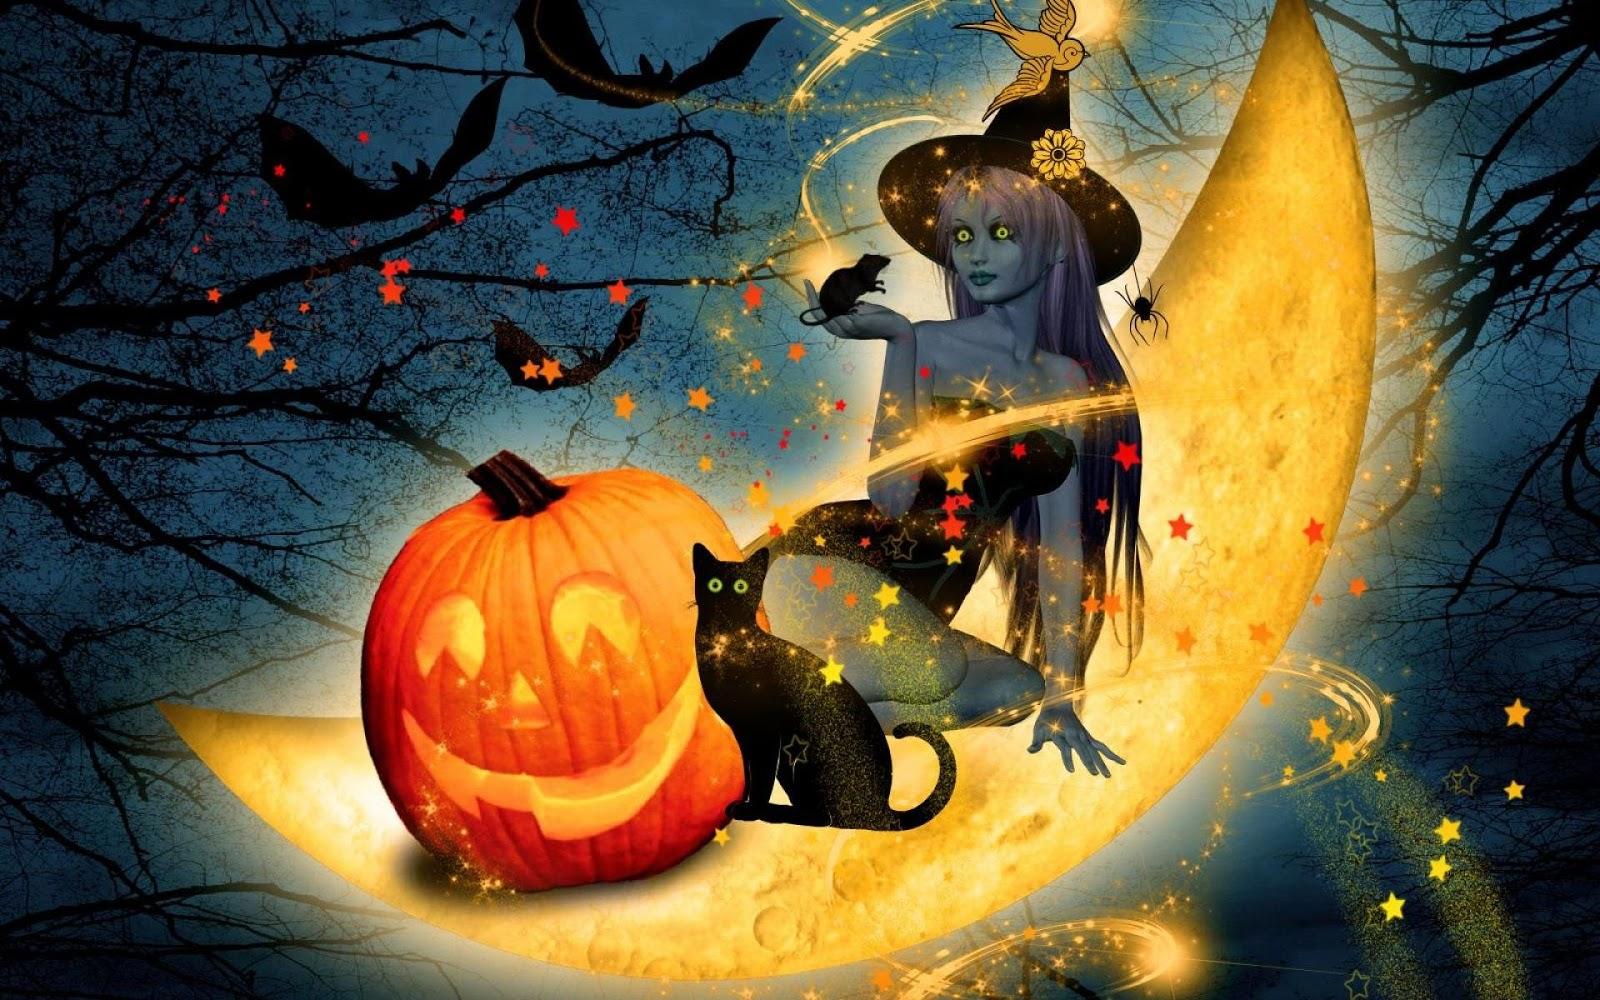 Fond d'écran 3d halloween - Fonds d'écran HD